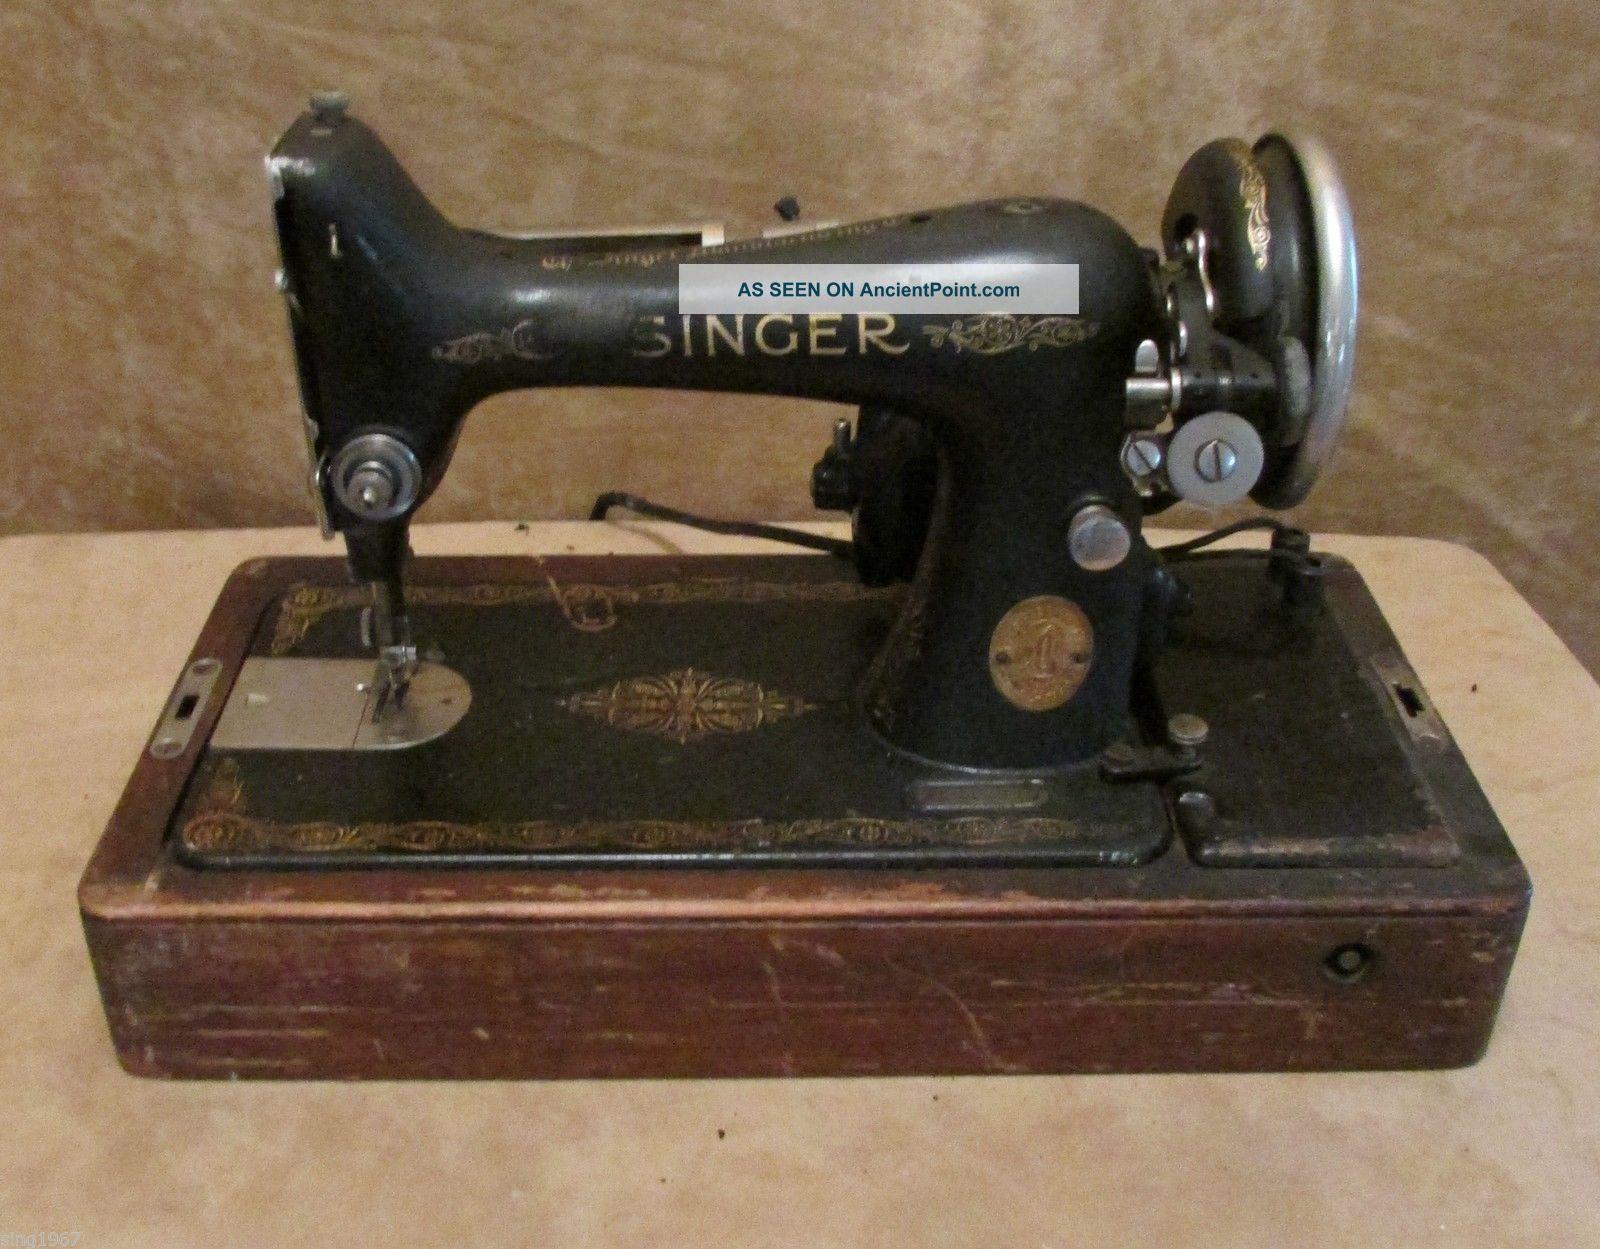 Vintage Singer 99 - 13 Industrial Sewing Machine Knee Controller Bentwood Case 99k Sewing Machines photo